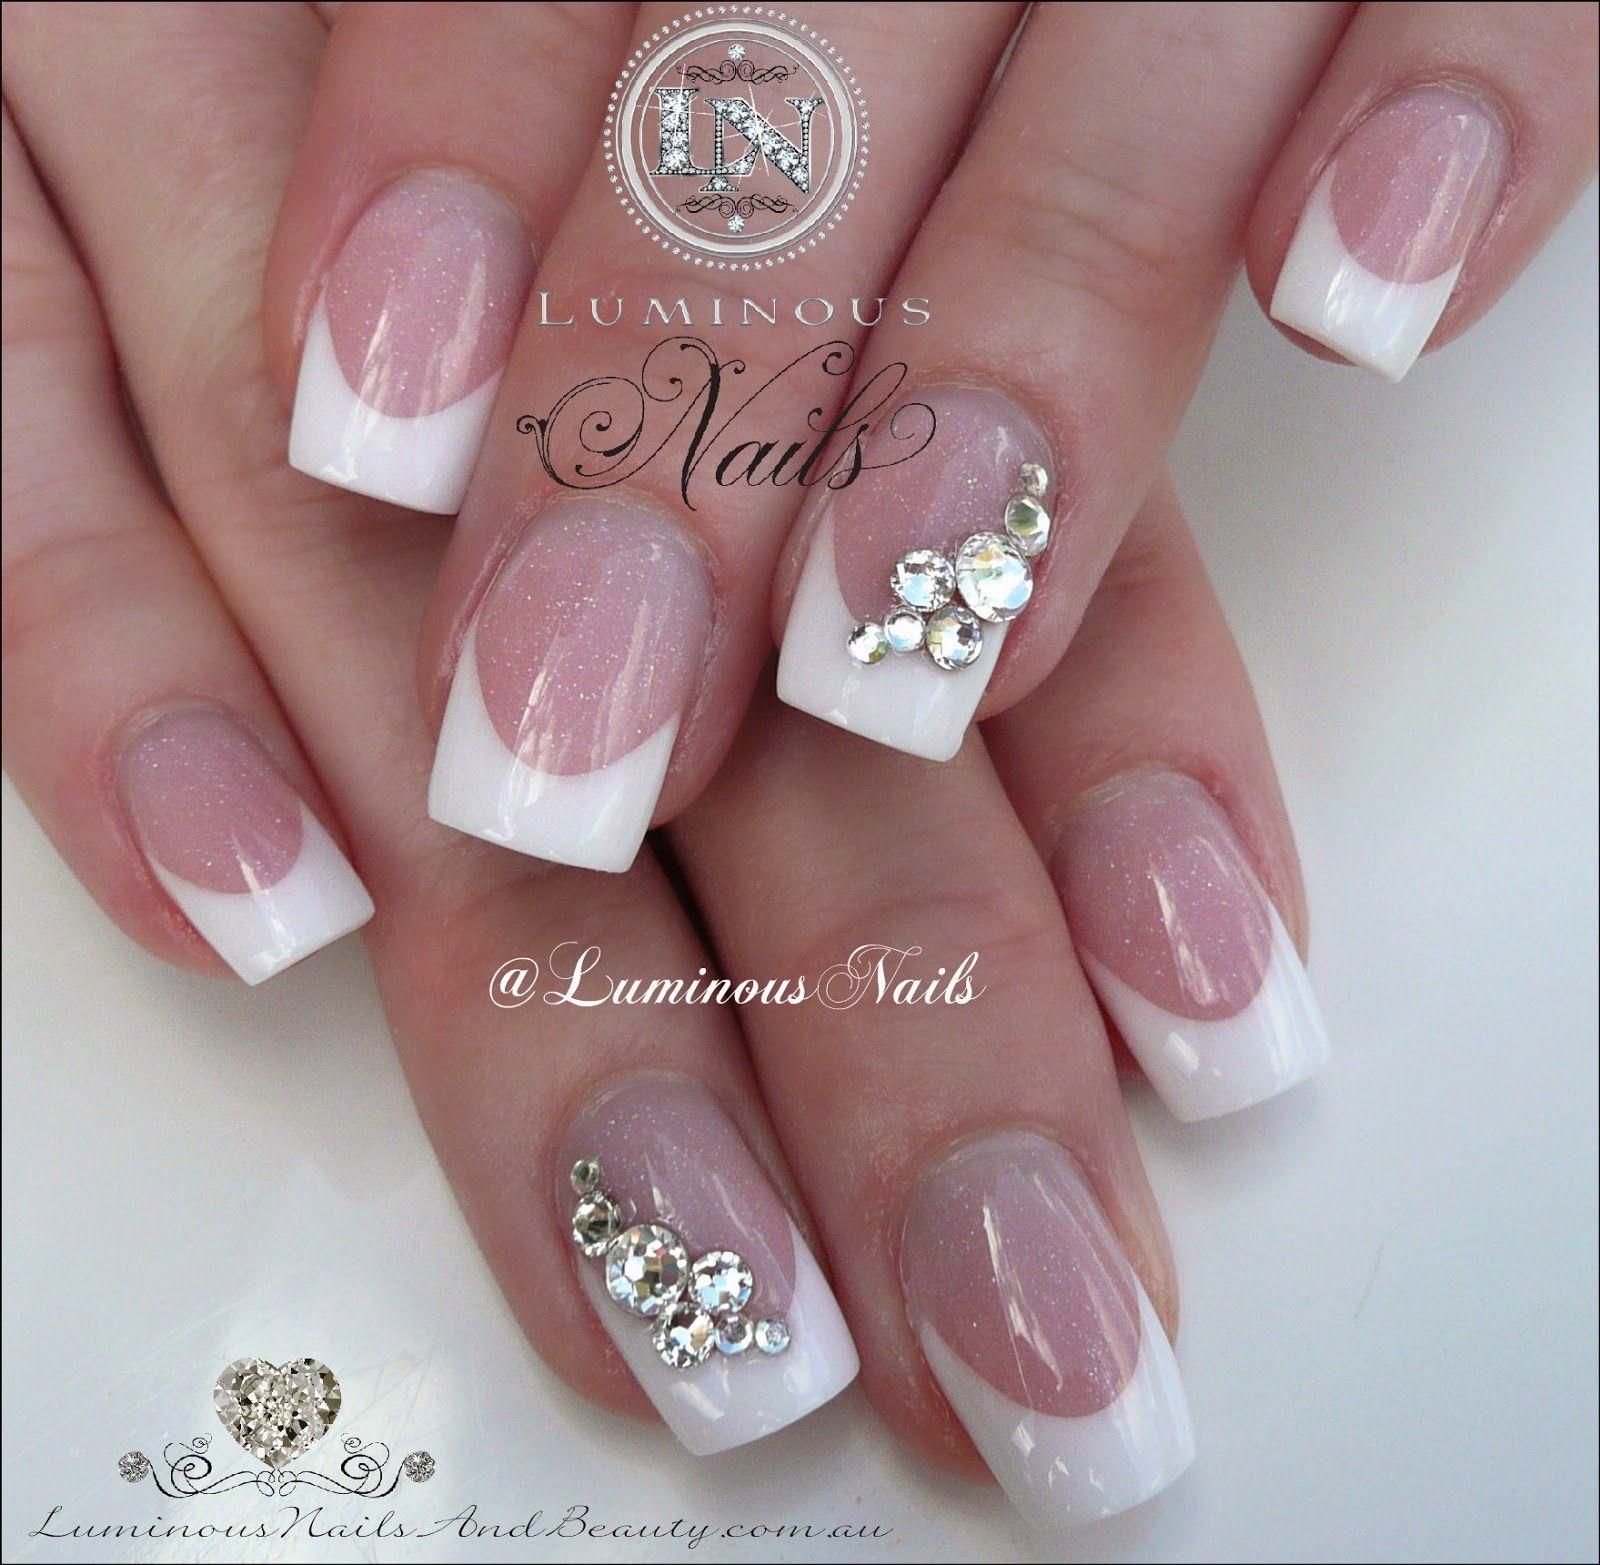 Luminous Nails Clic French Wedding With Swarovski Crystals